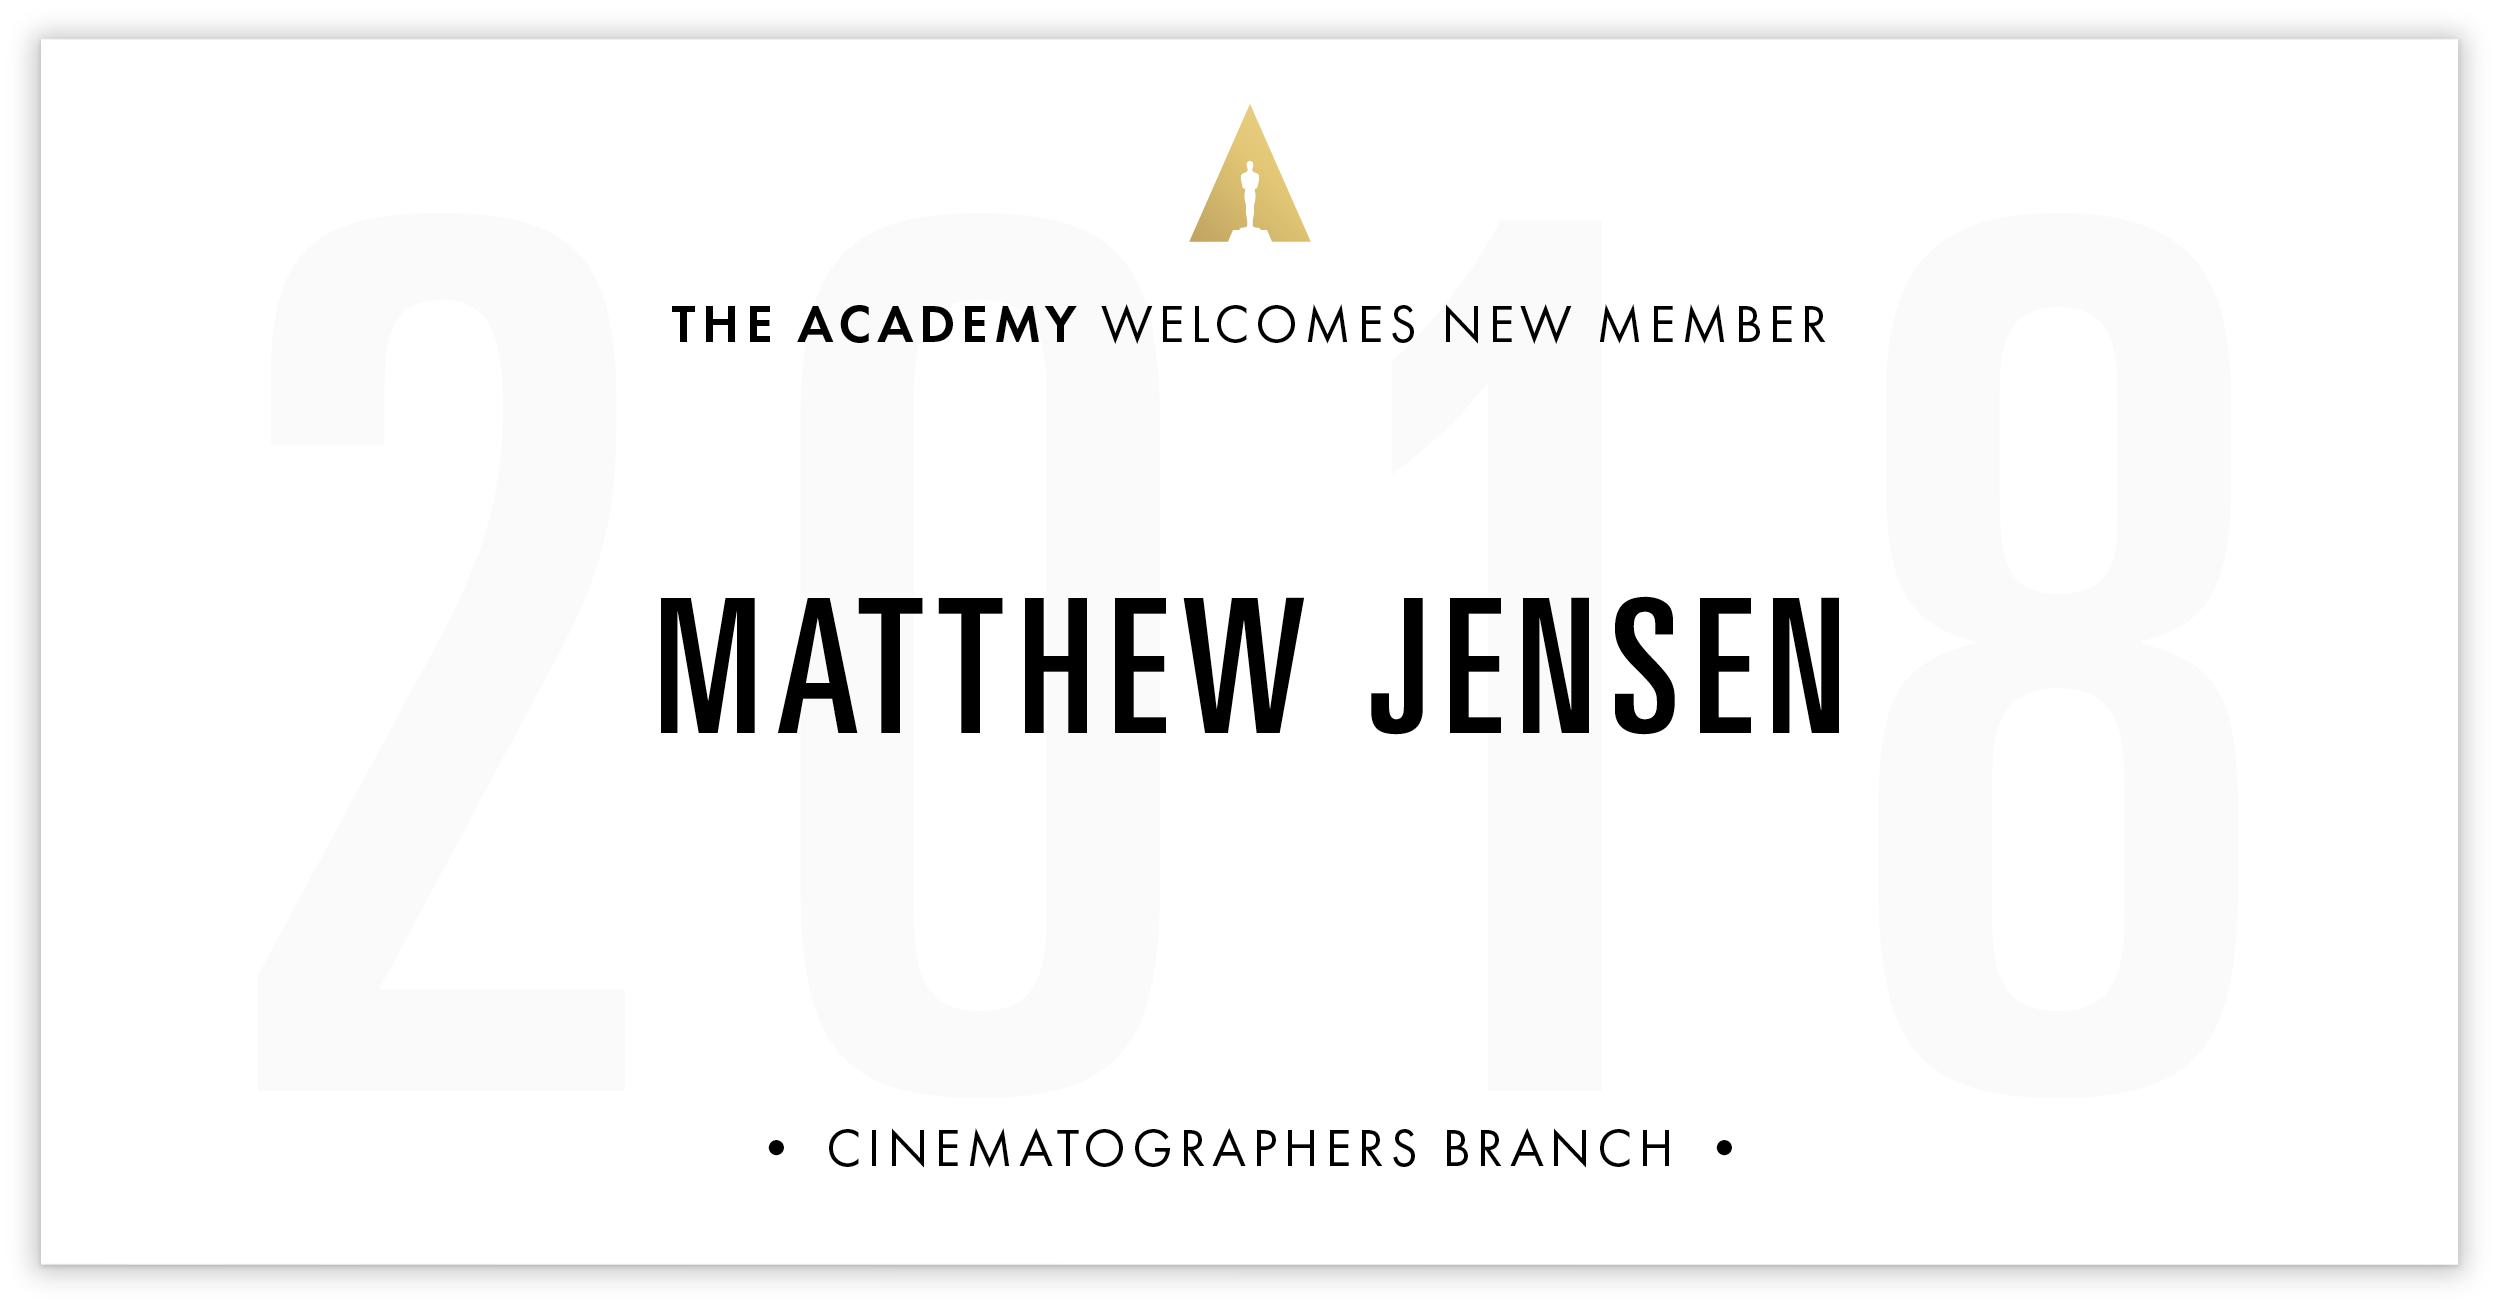 Matthew Jensen is invited!